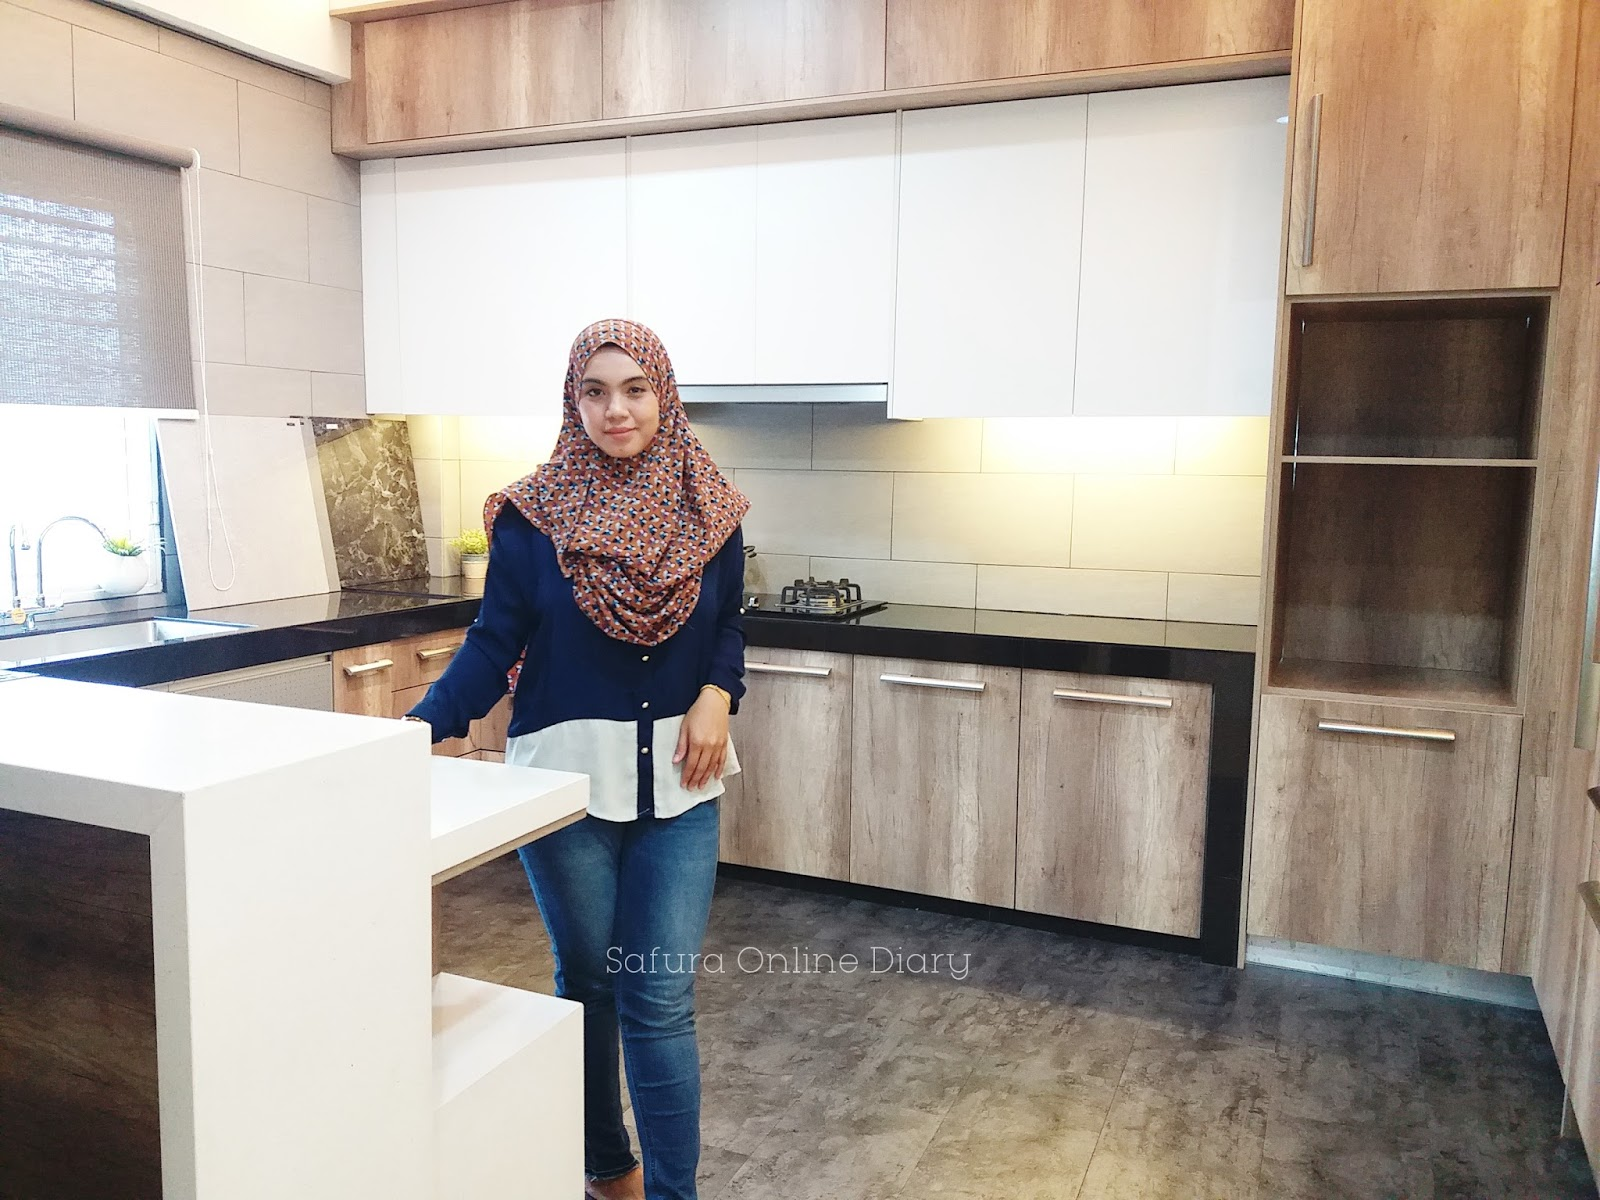 Survey Kitchen Kabinet Rumah Kami Di Intech Kitchen Kajang Safura Online Diary